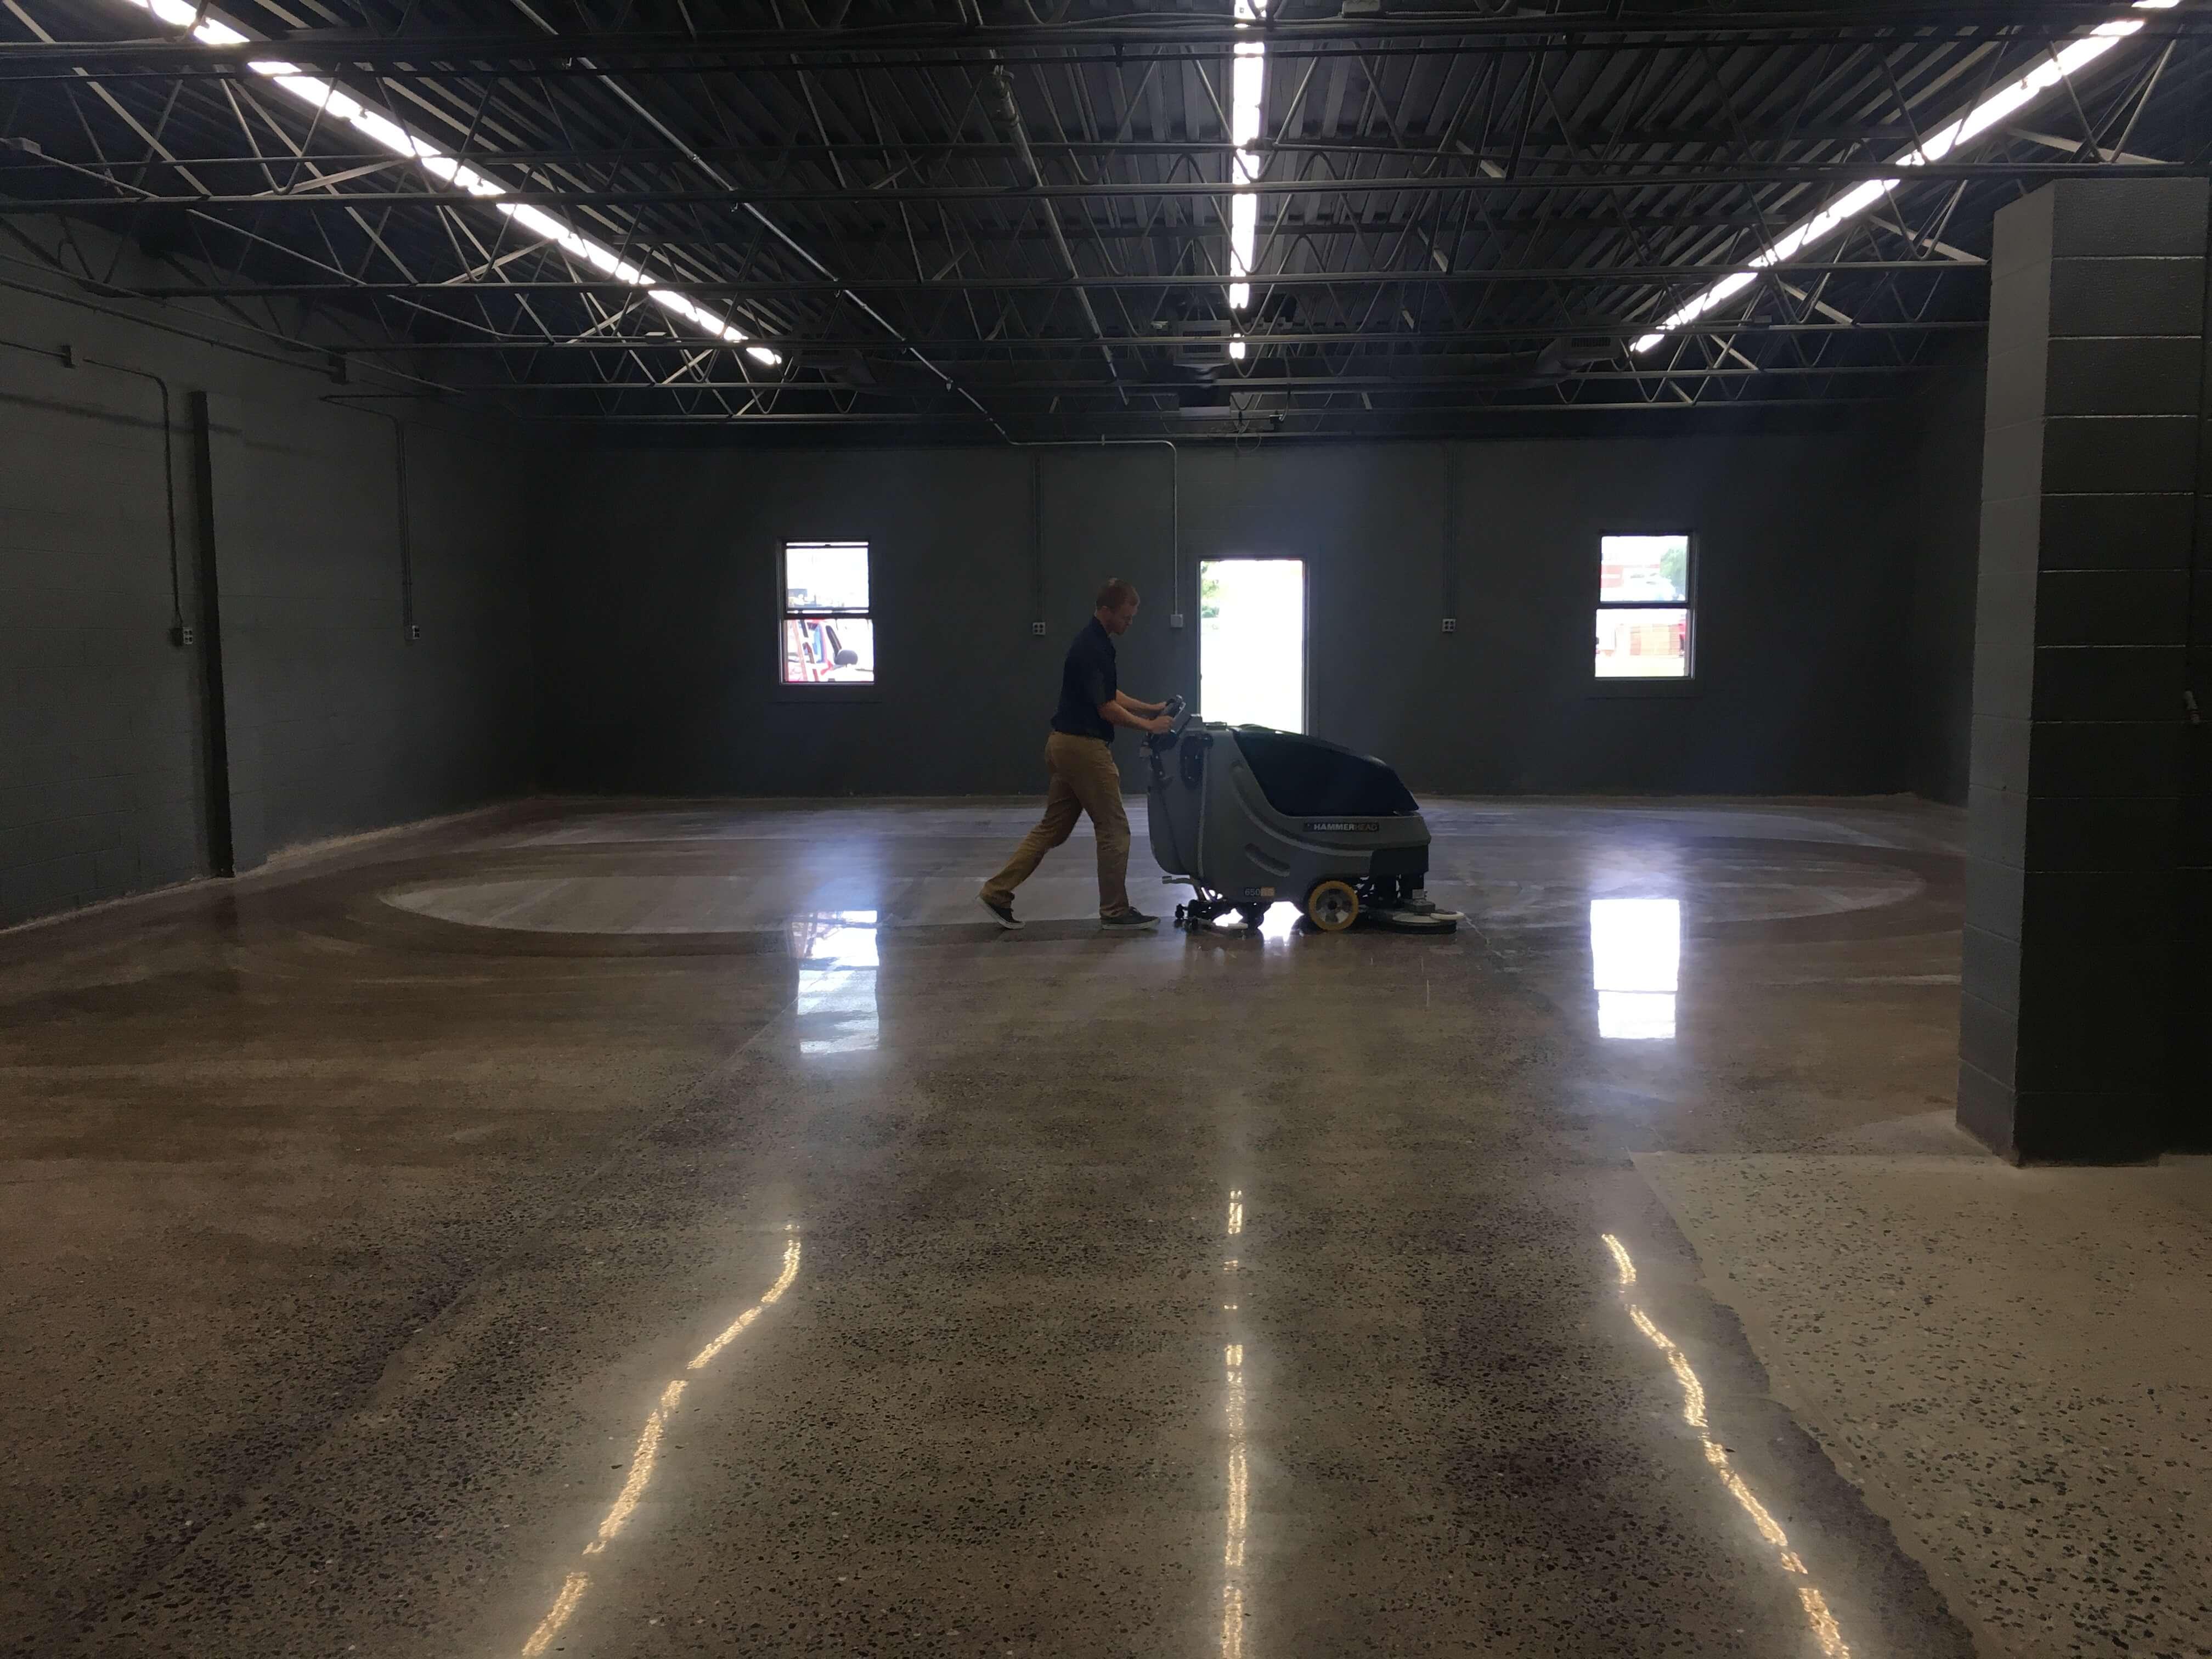 Hammerhead 650rs scrubber bortek industries inc for Concrete floor scrubber